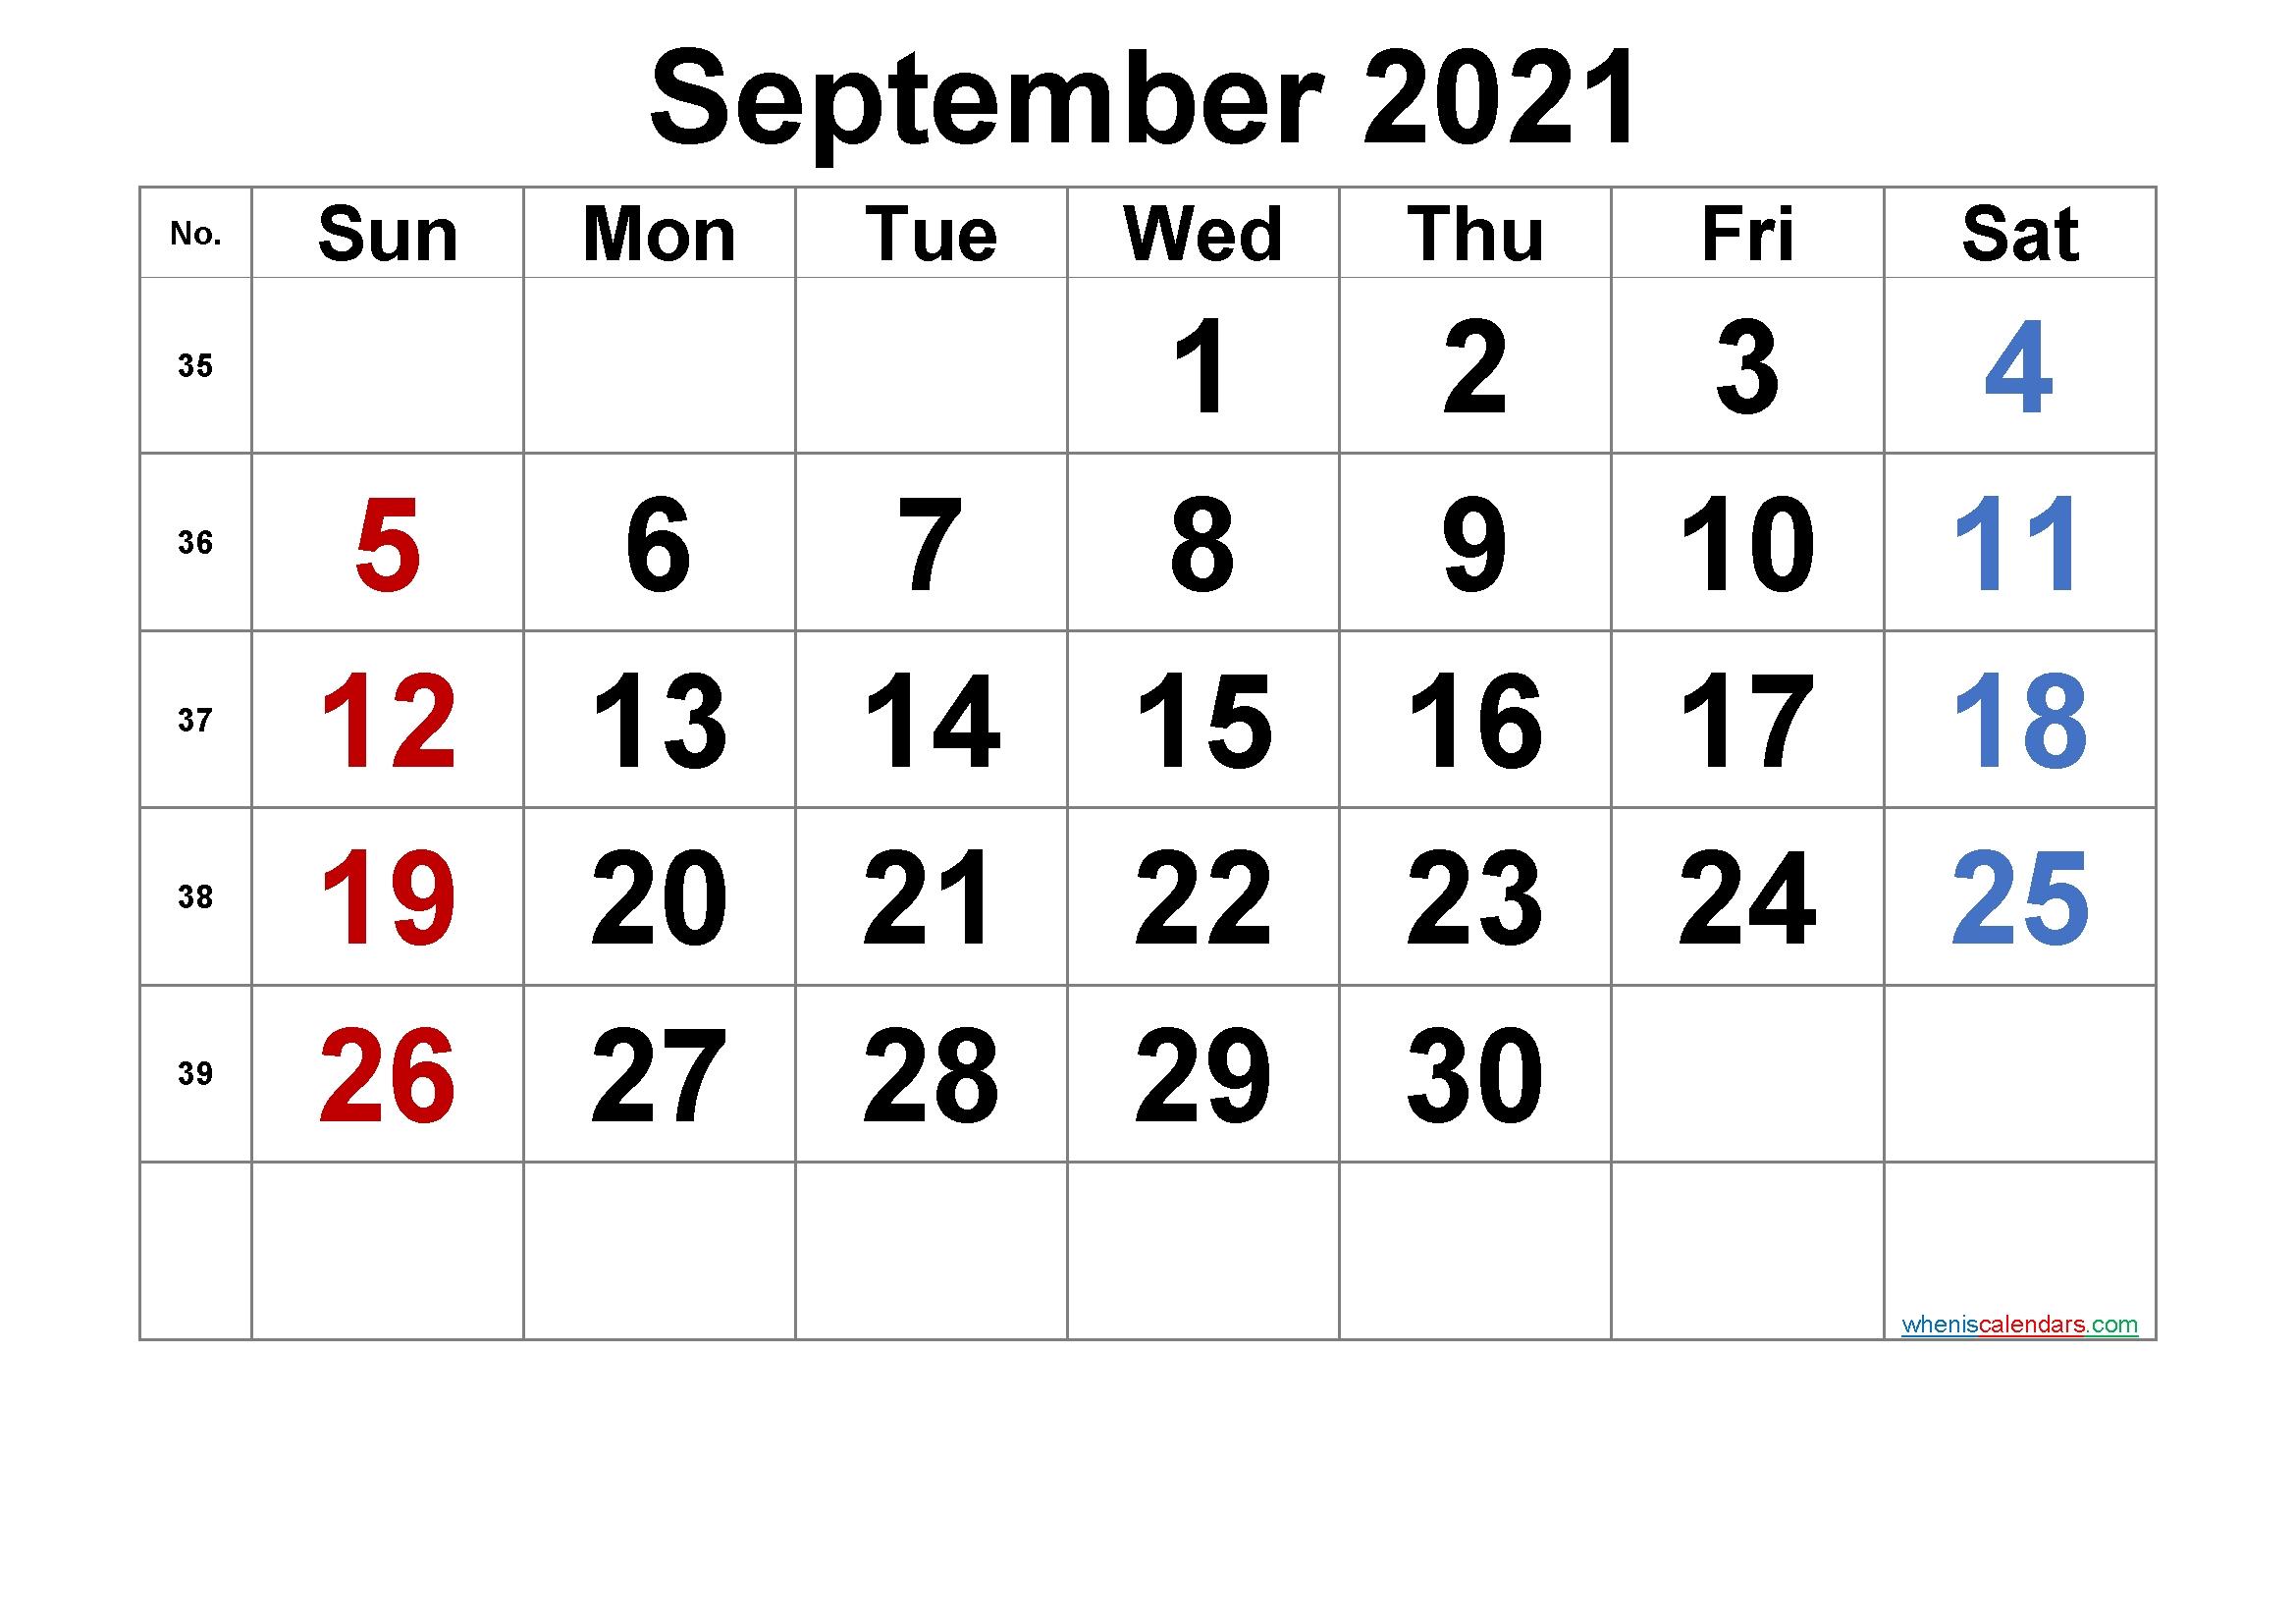 20+ September 2021 Calendar - Free Download Printable Canada September 2021 Calendar